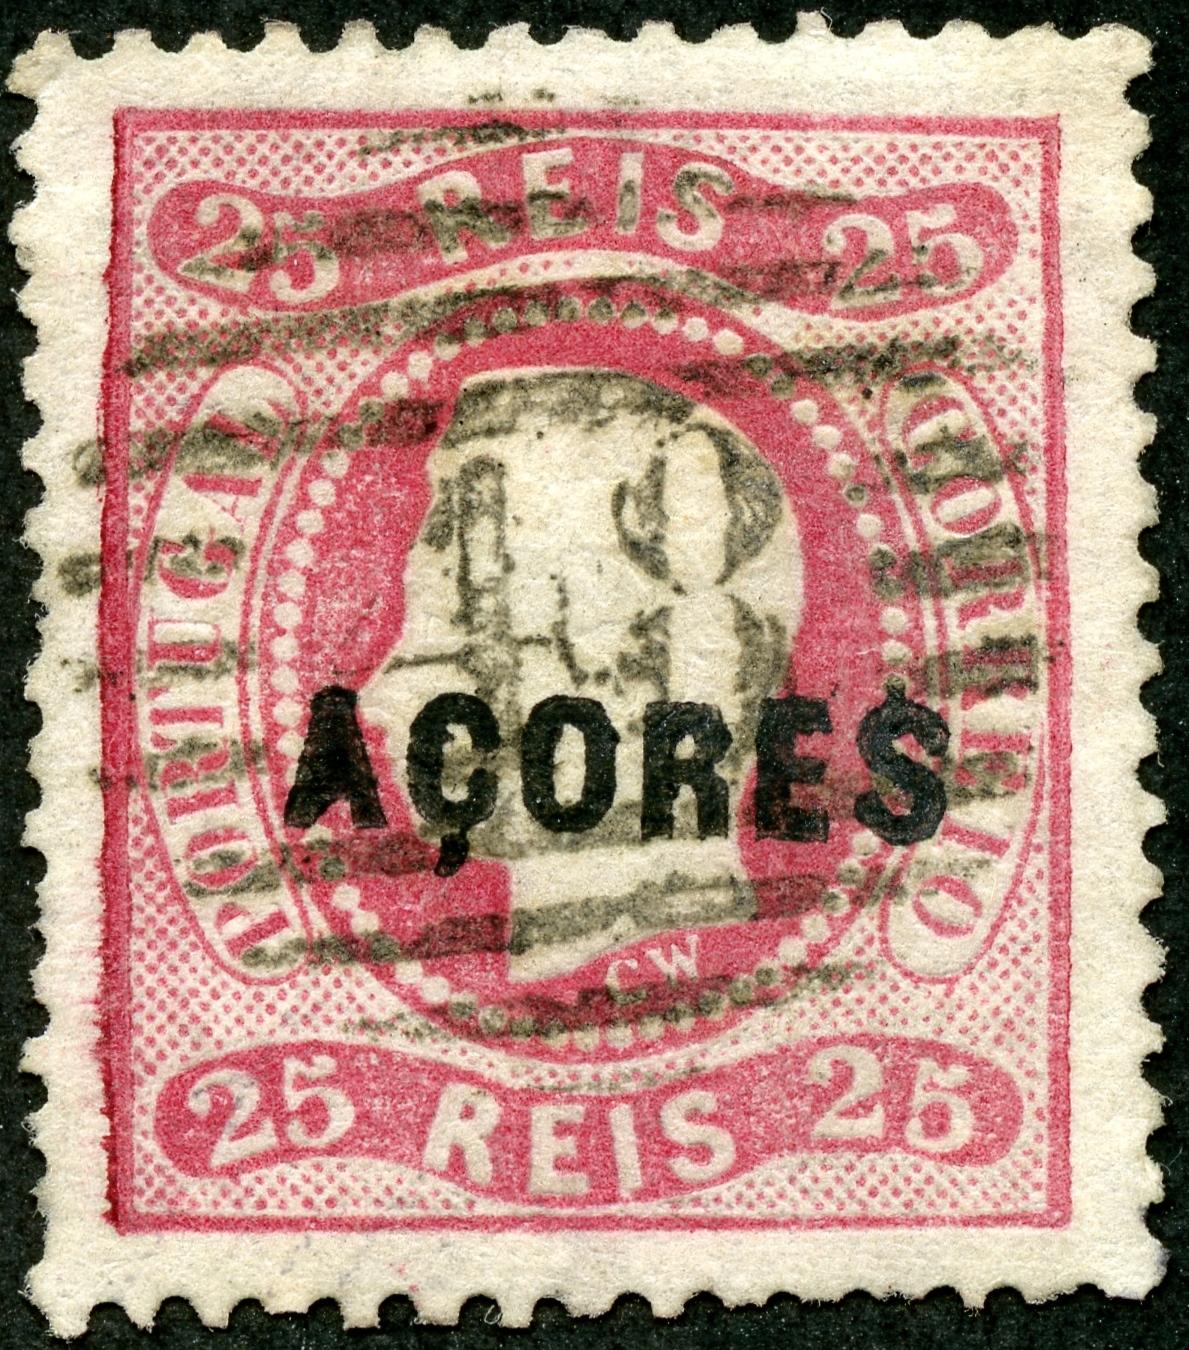 1925 To 1932 Bechanaland Stamps Postage Due Overprints Bechuanaland (until 1966)